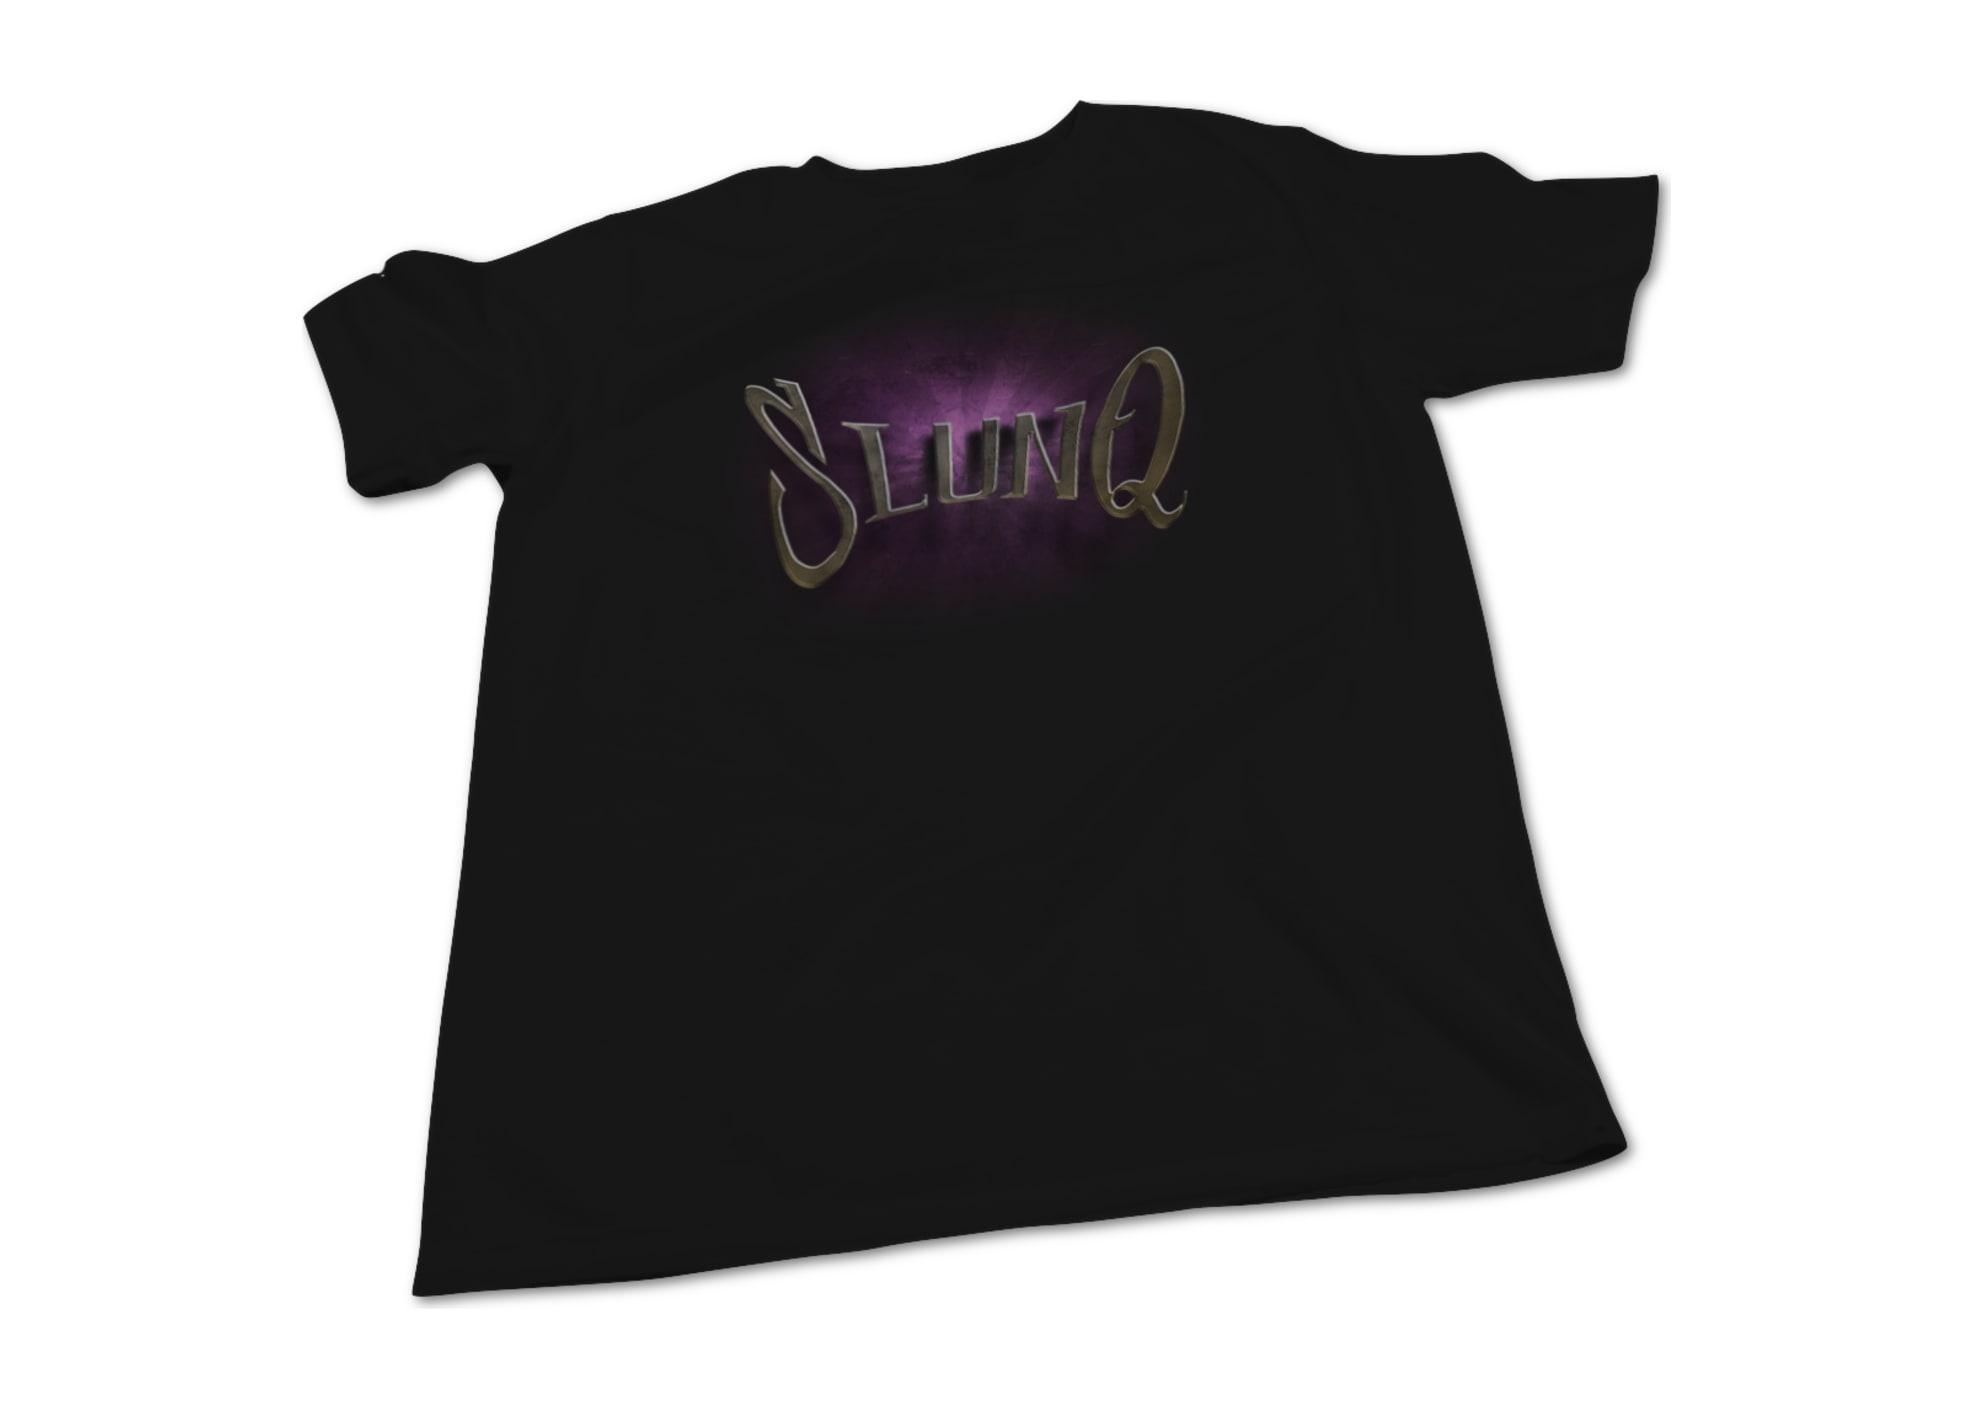 Slunq logo pink 1570411432